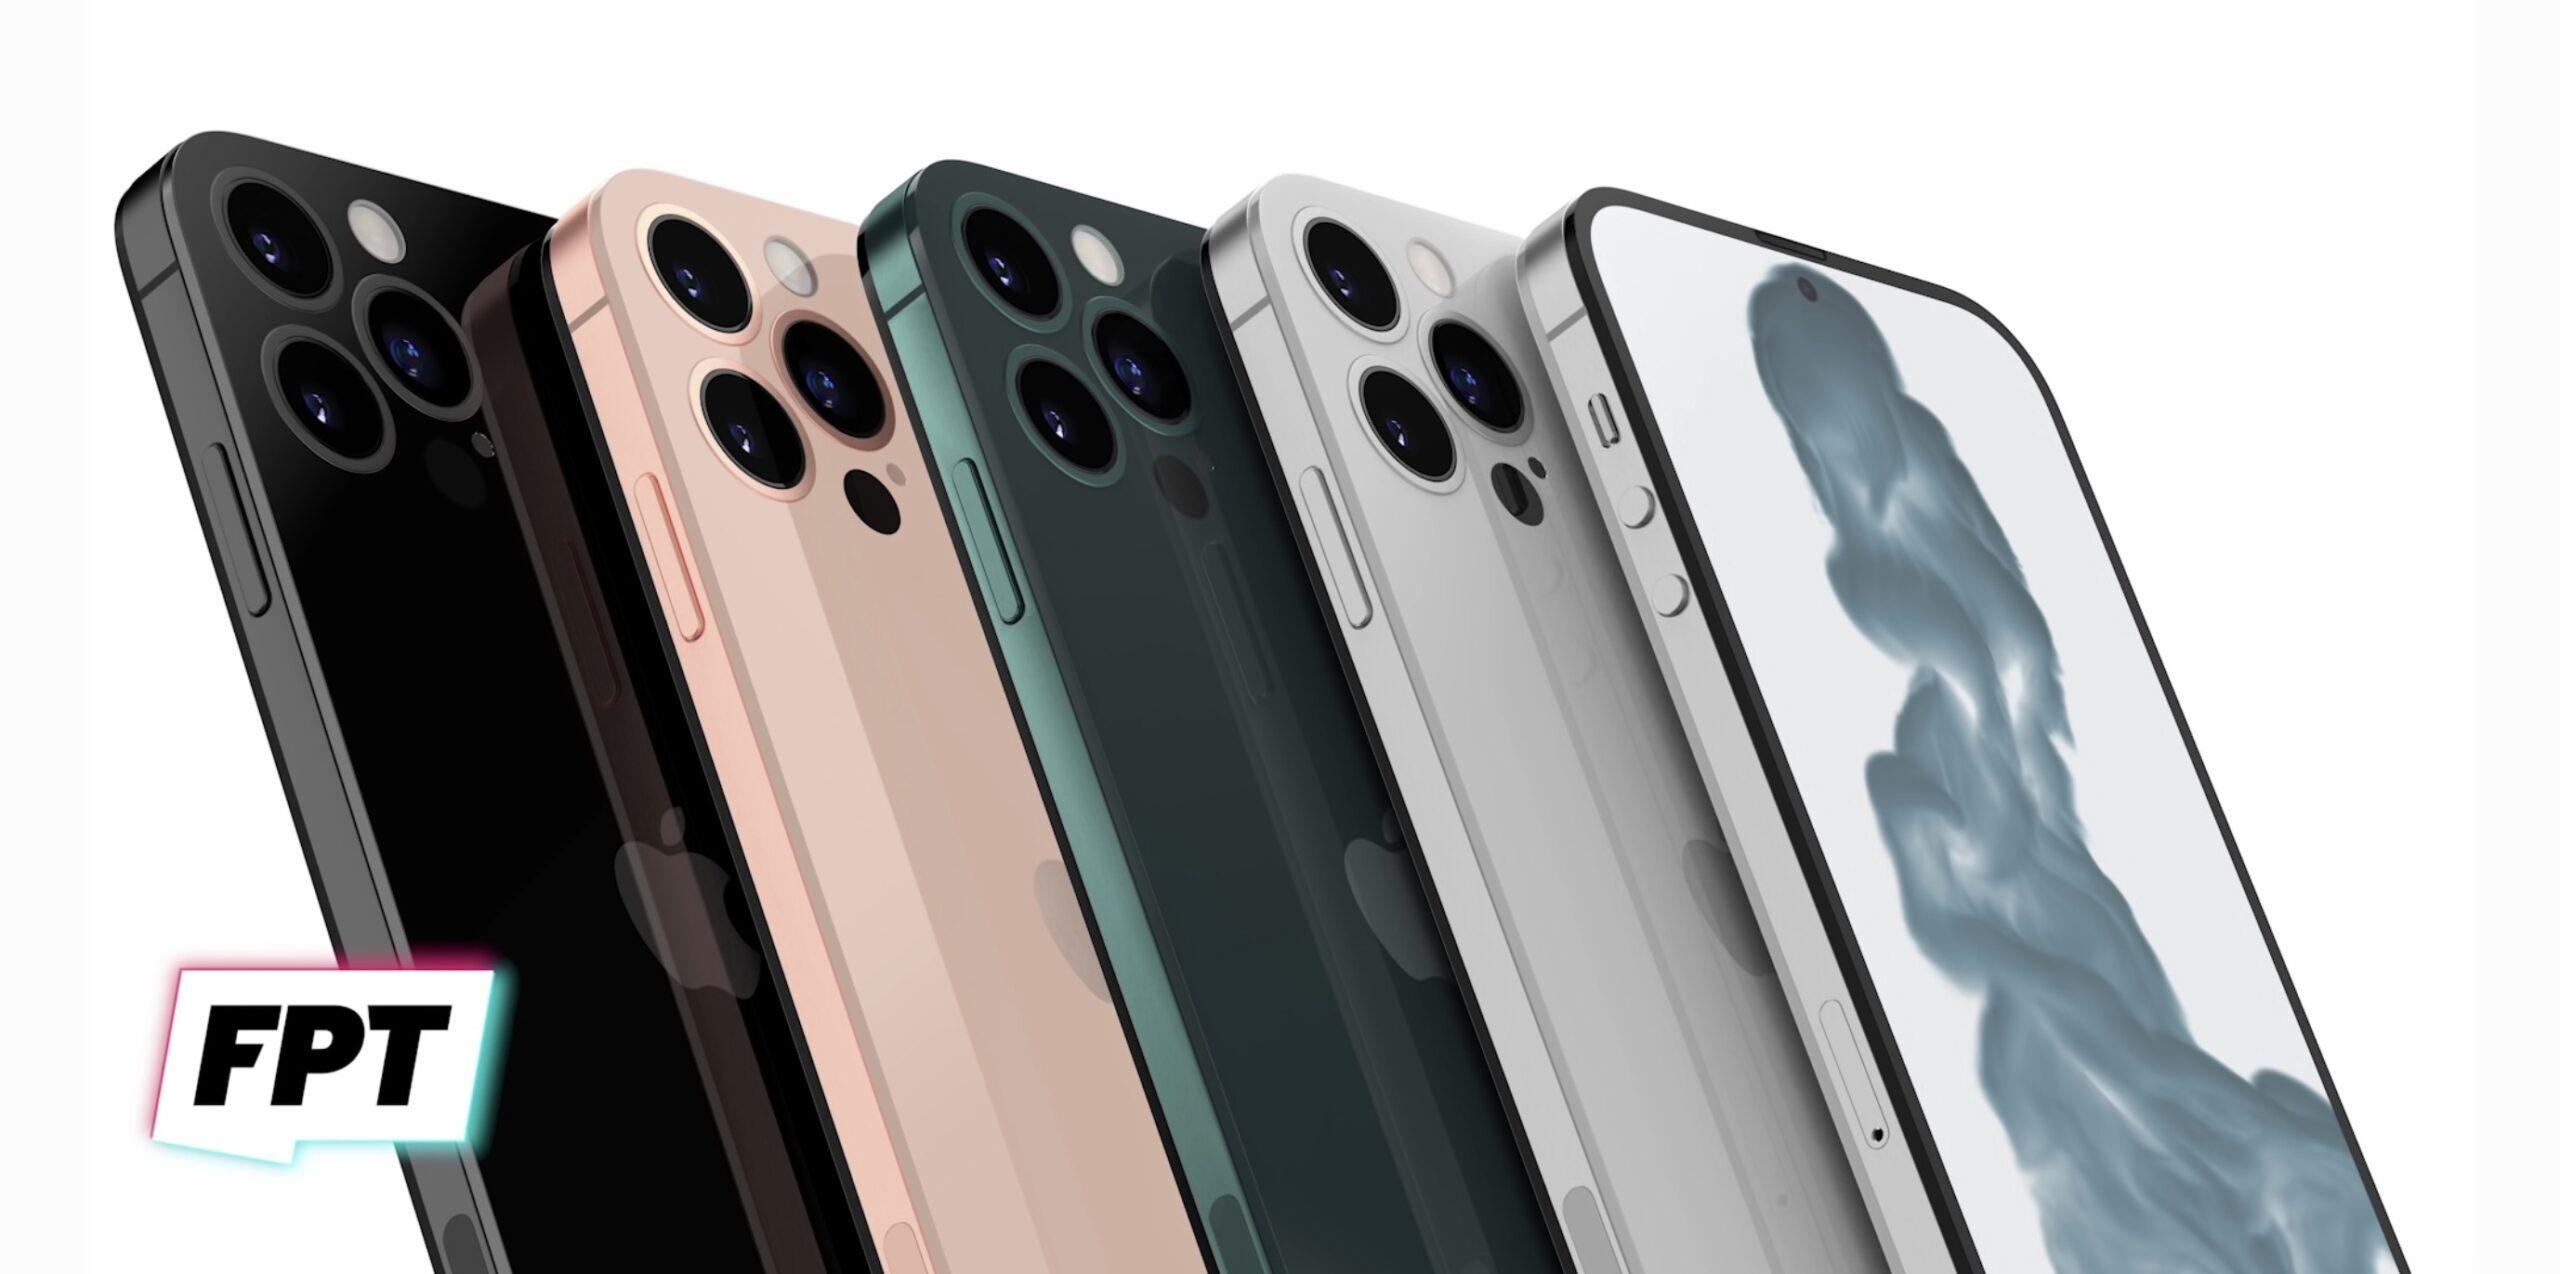 iPhone 14 : rumeurs, design, encoche, date de sortie du prochain smartphone Apple